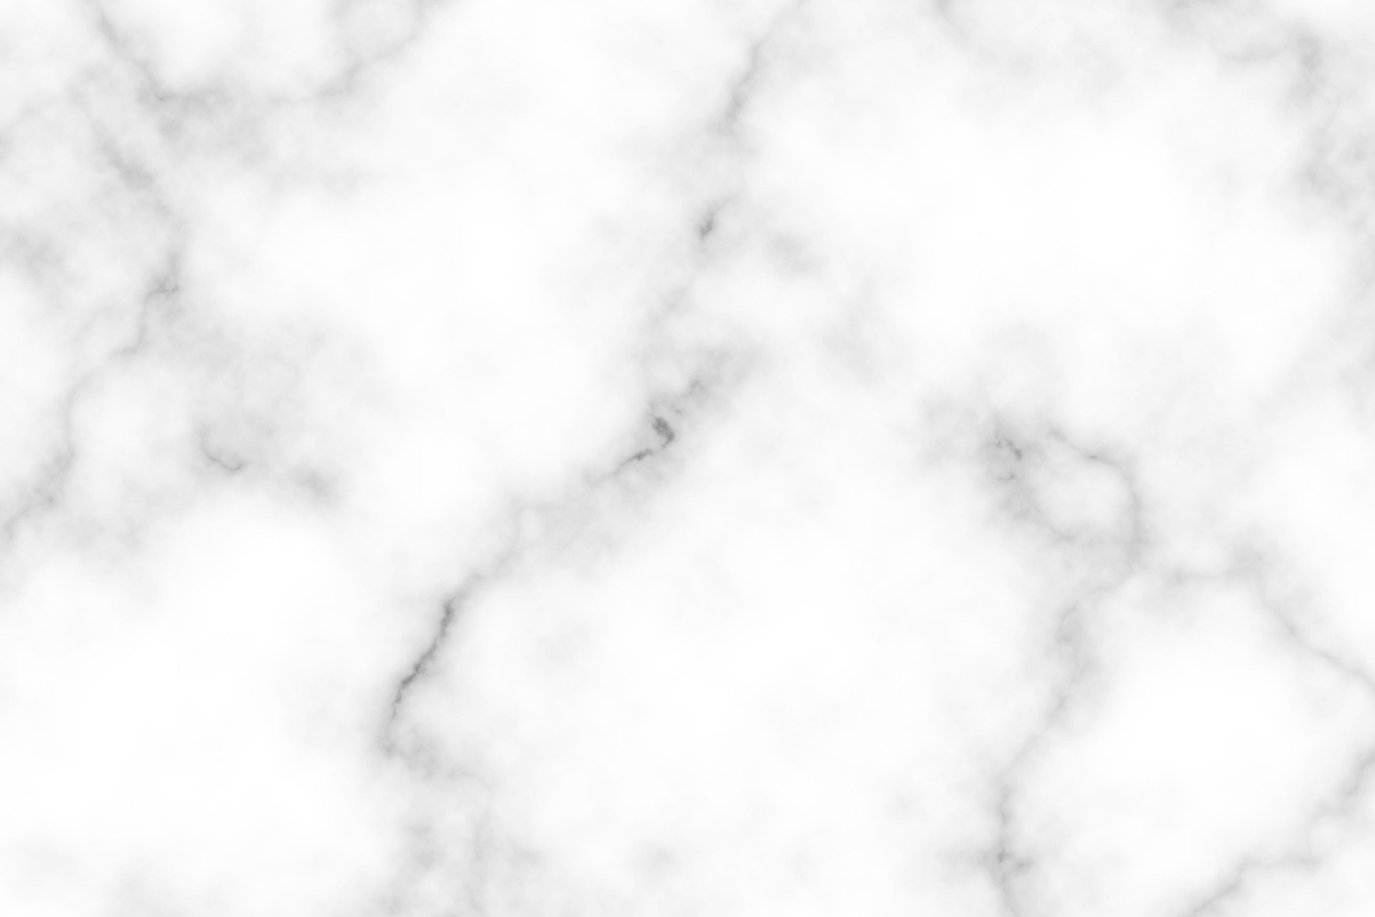 White Marble - Lux Graphic Design_edited.jpg